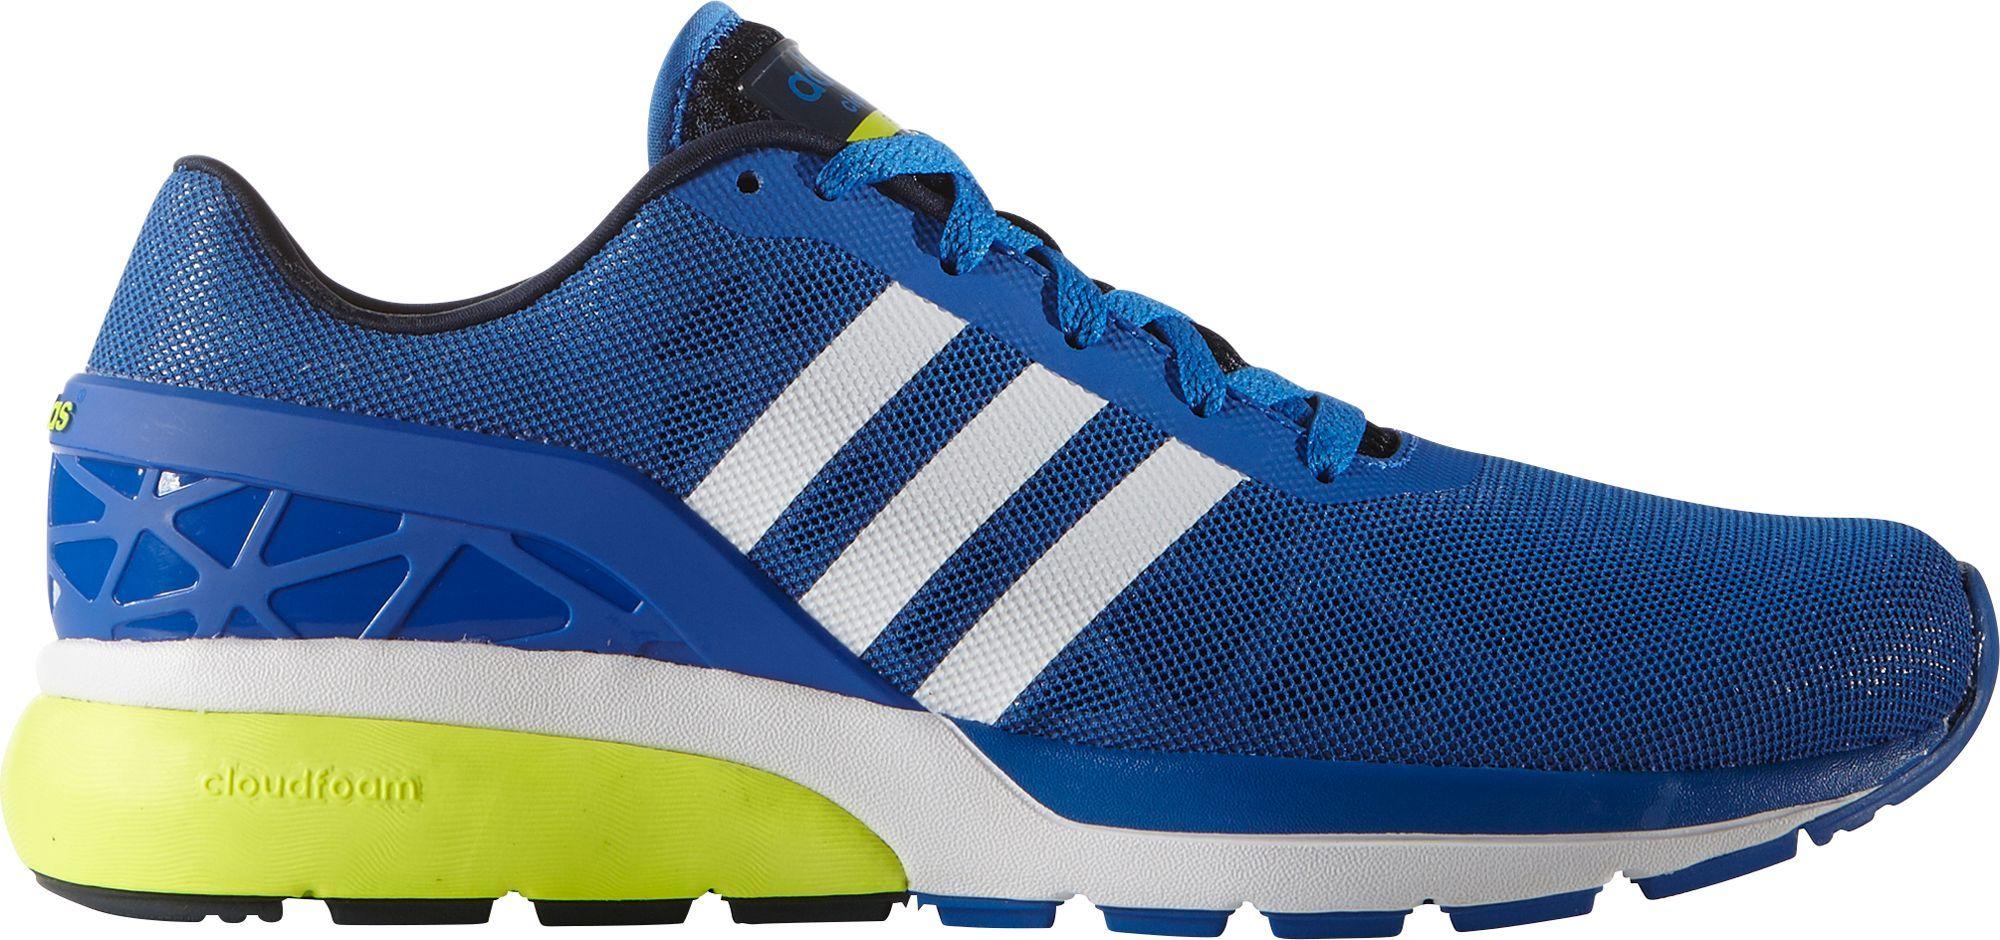 Adidas men, Adidas, Running shoes for men